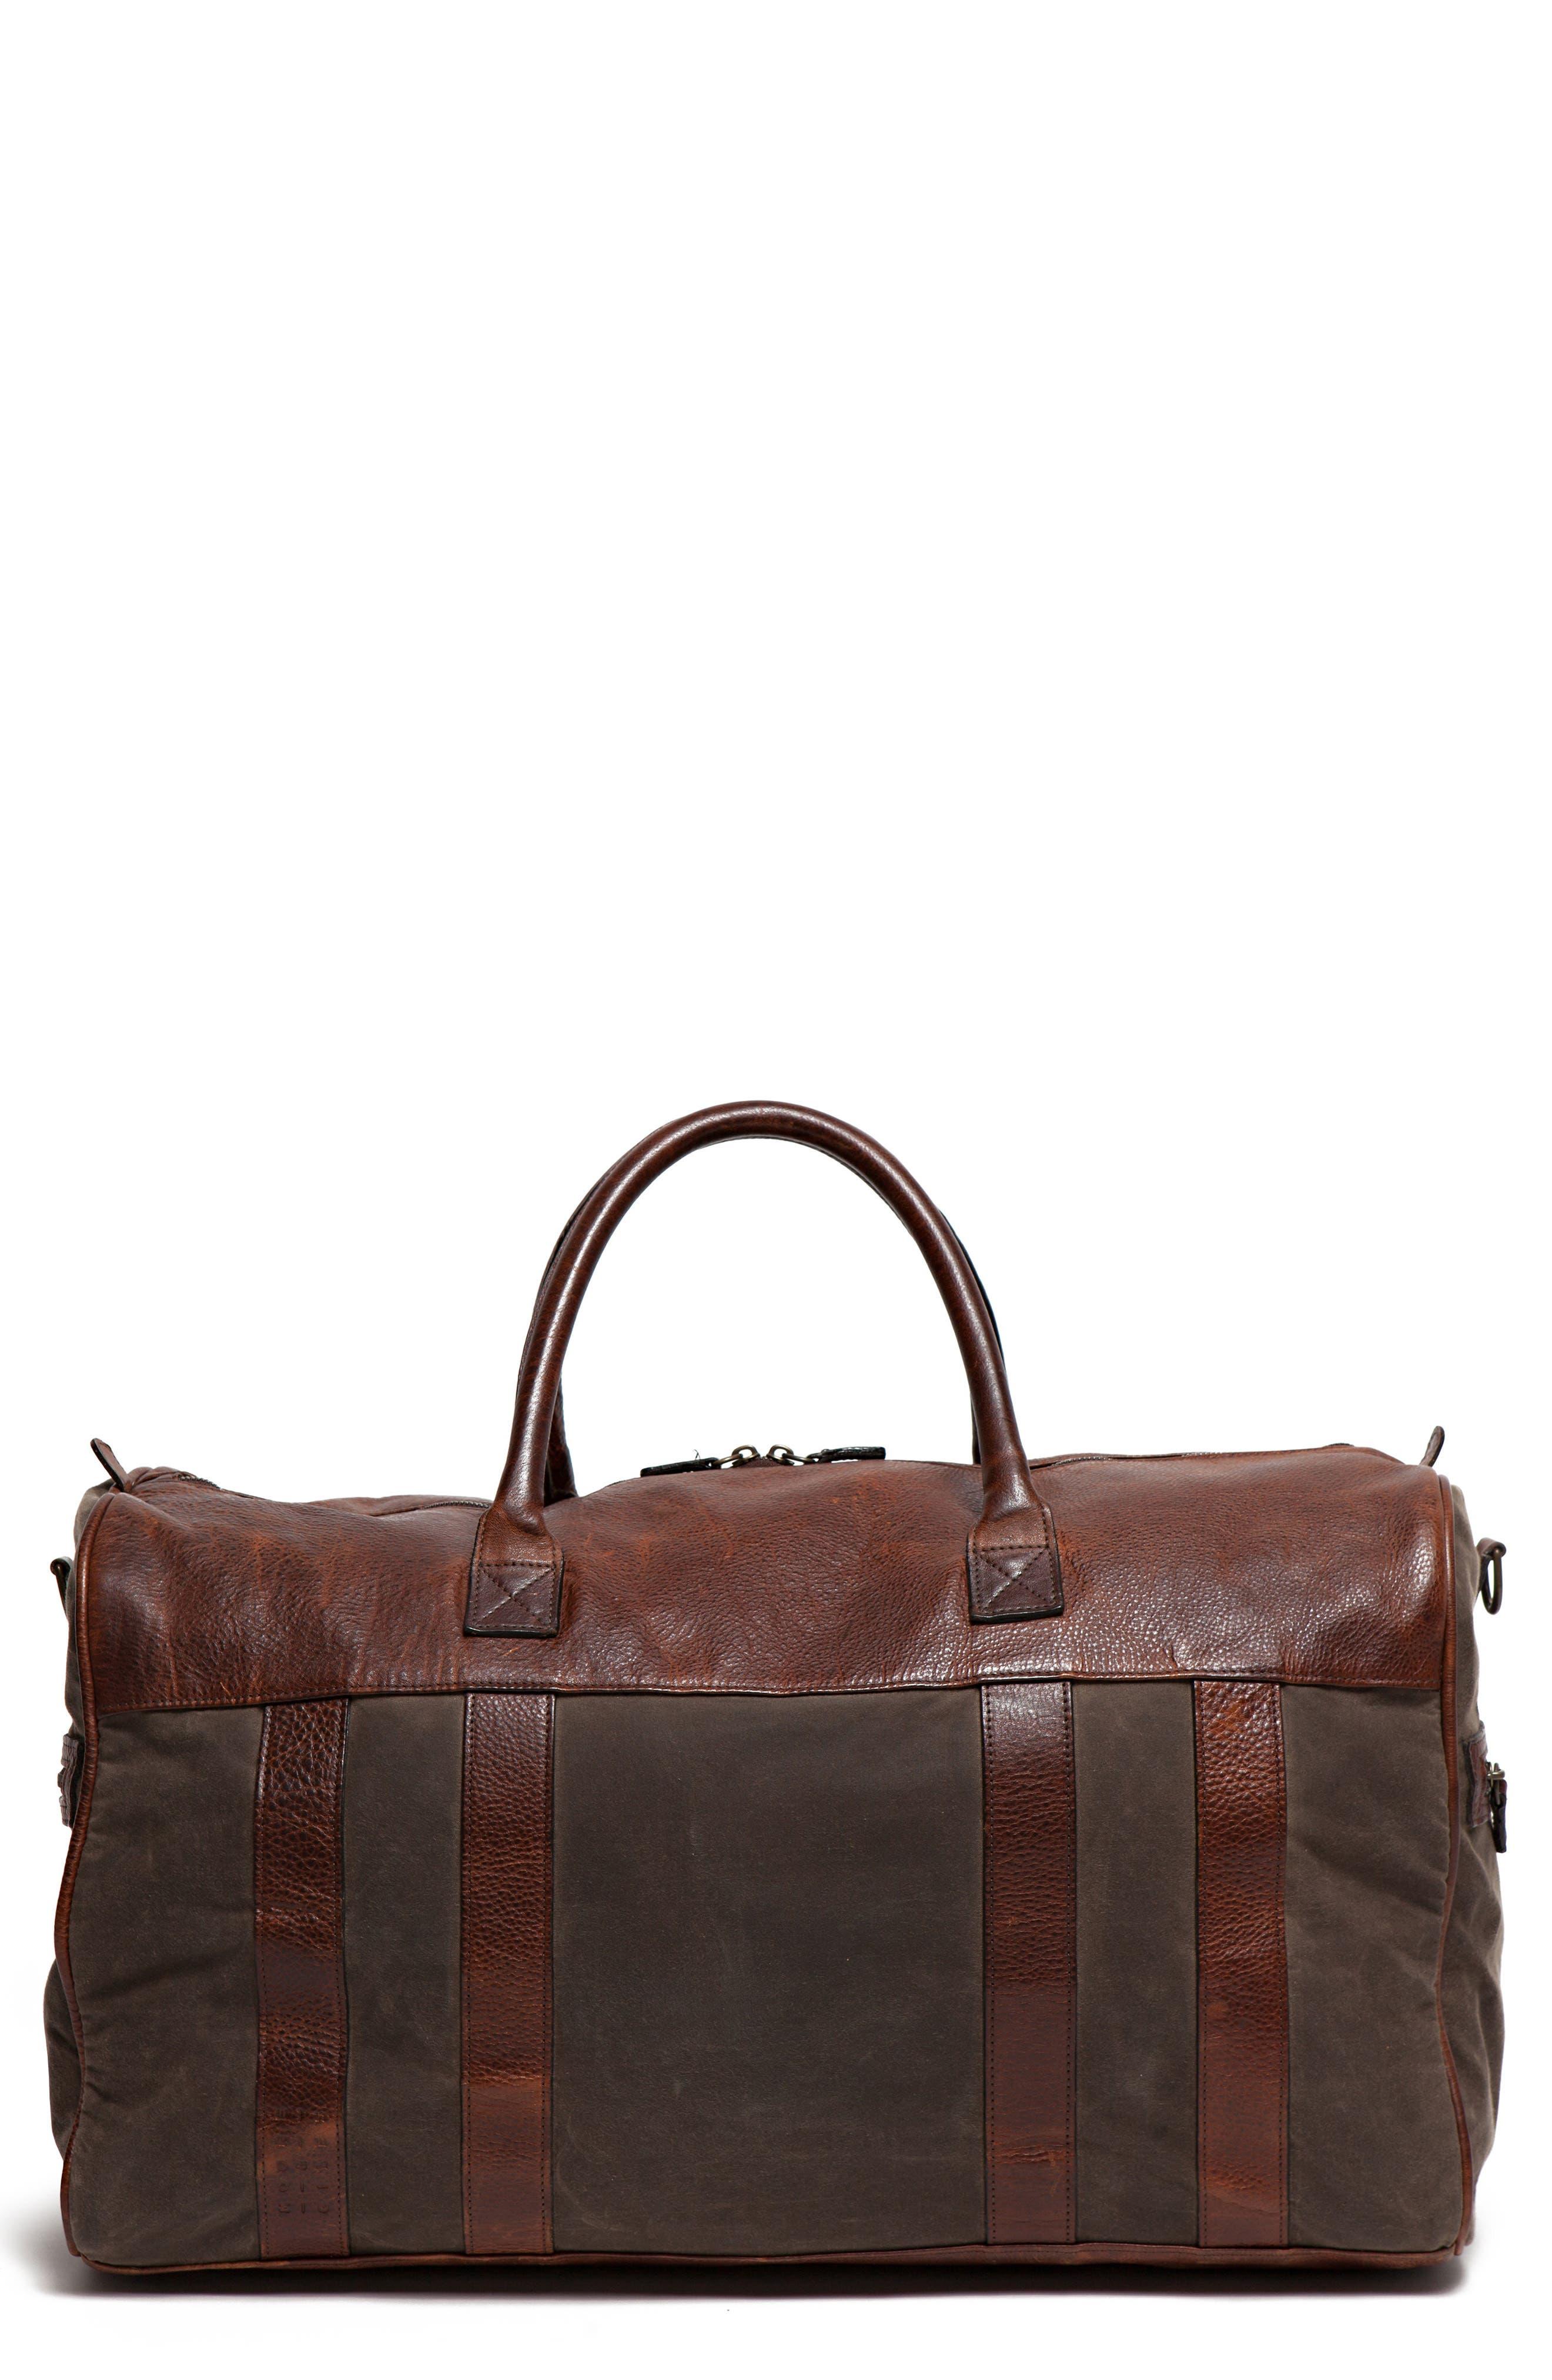 Cleland XL Duffel Bag,                             Main thumbnail 1, color,